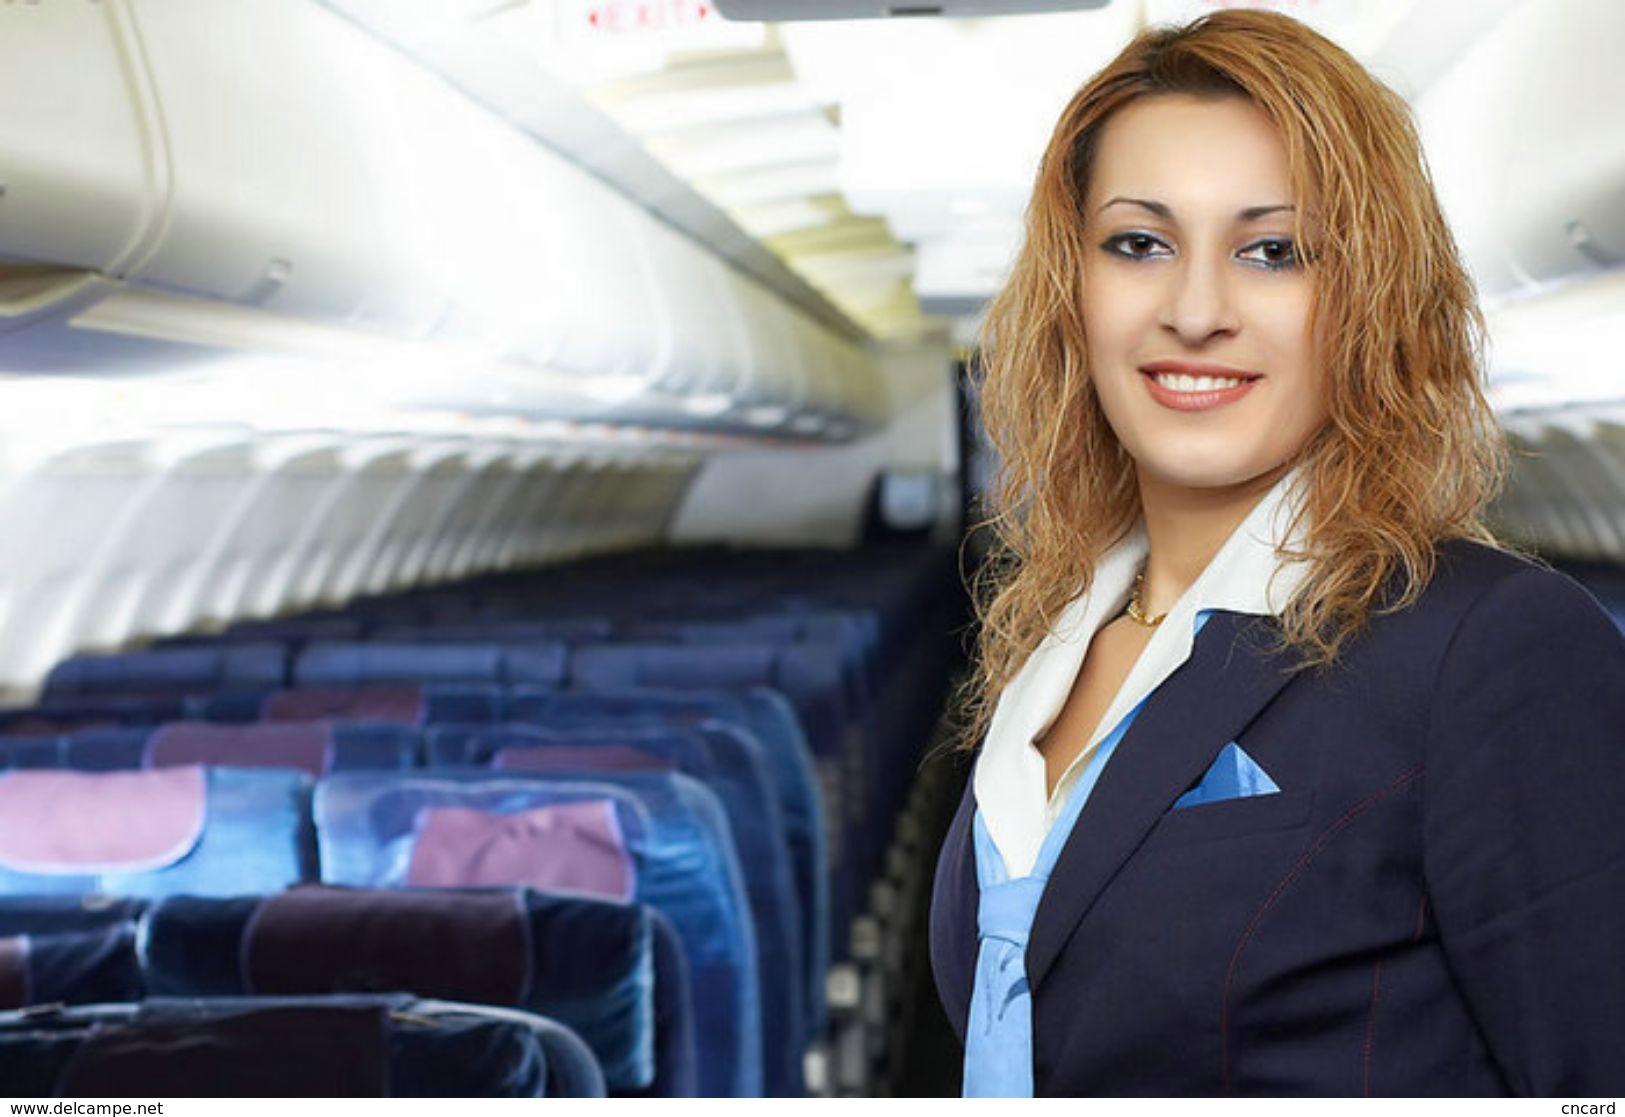 T80-100 ]  Flight Attendants Air Attendants Stewardesses Hostesses Cabin Crew , China Pre-paid Card, Postal Stationery - Jobs